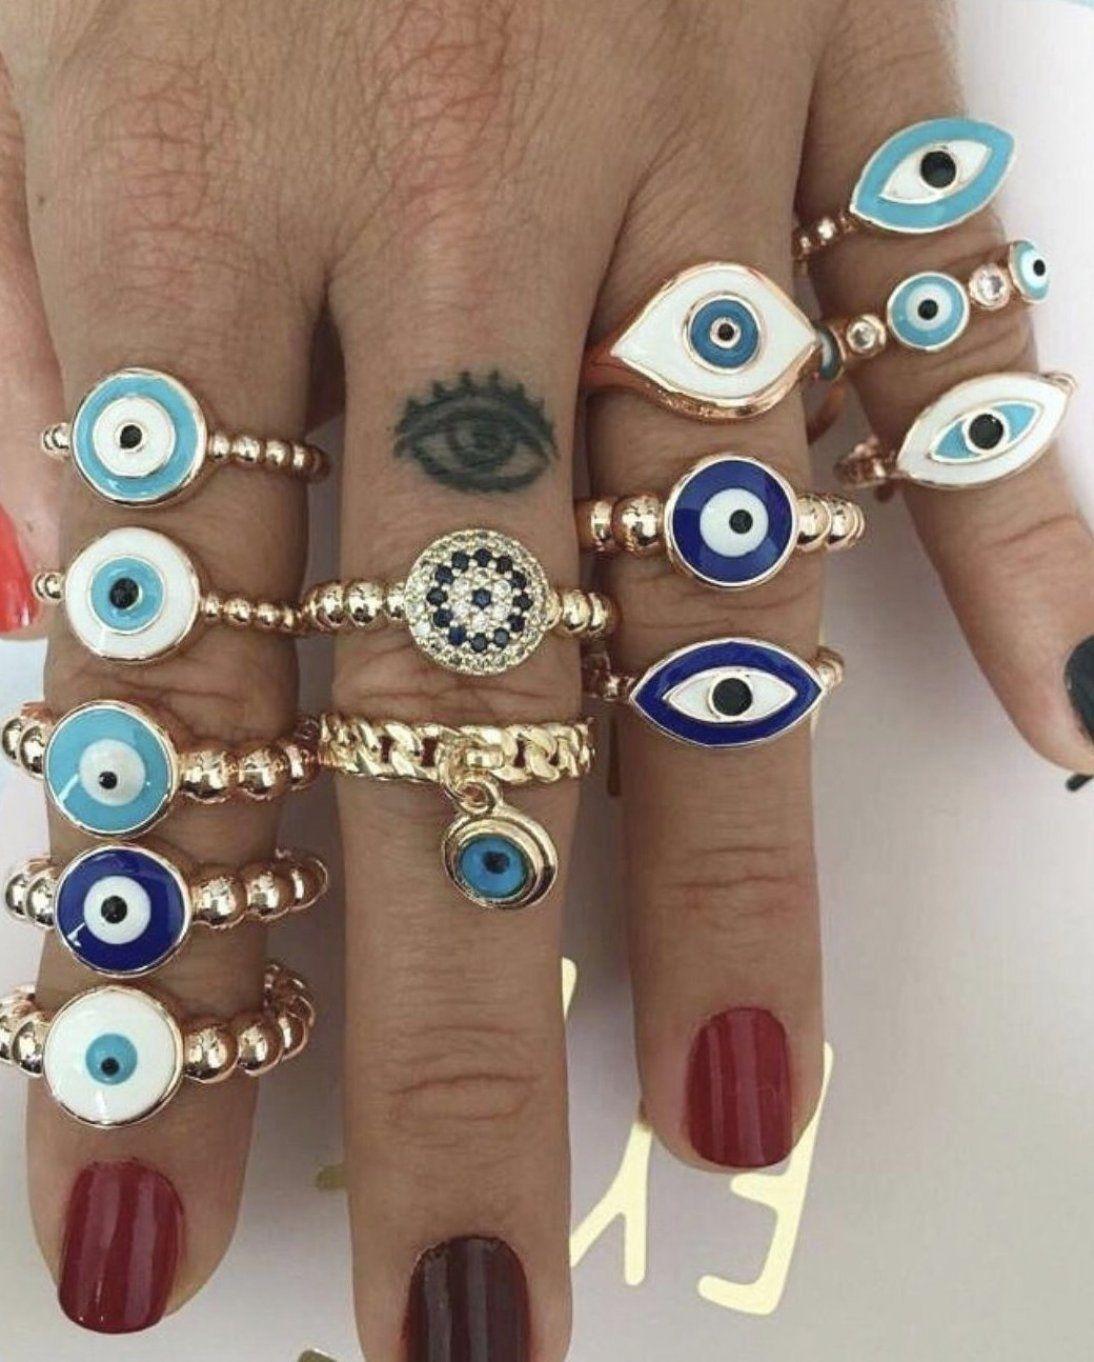 Blue evil eye ring  adjustable ring  dainty ring  dangle evil eye ring  silver gold rings  evil eye jewelry  glass evil eye bead  joint ring #evileyering #jewelry #danglerings #ring #silverring #greekjewelry #giftforher #rosegoldring #daintyevileyering #daintyring #evileye